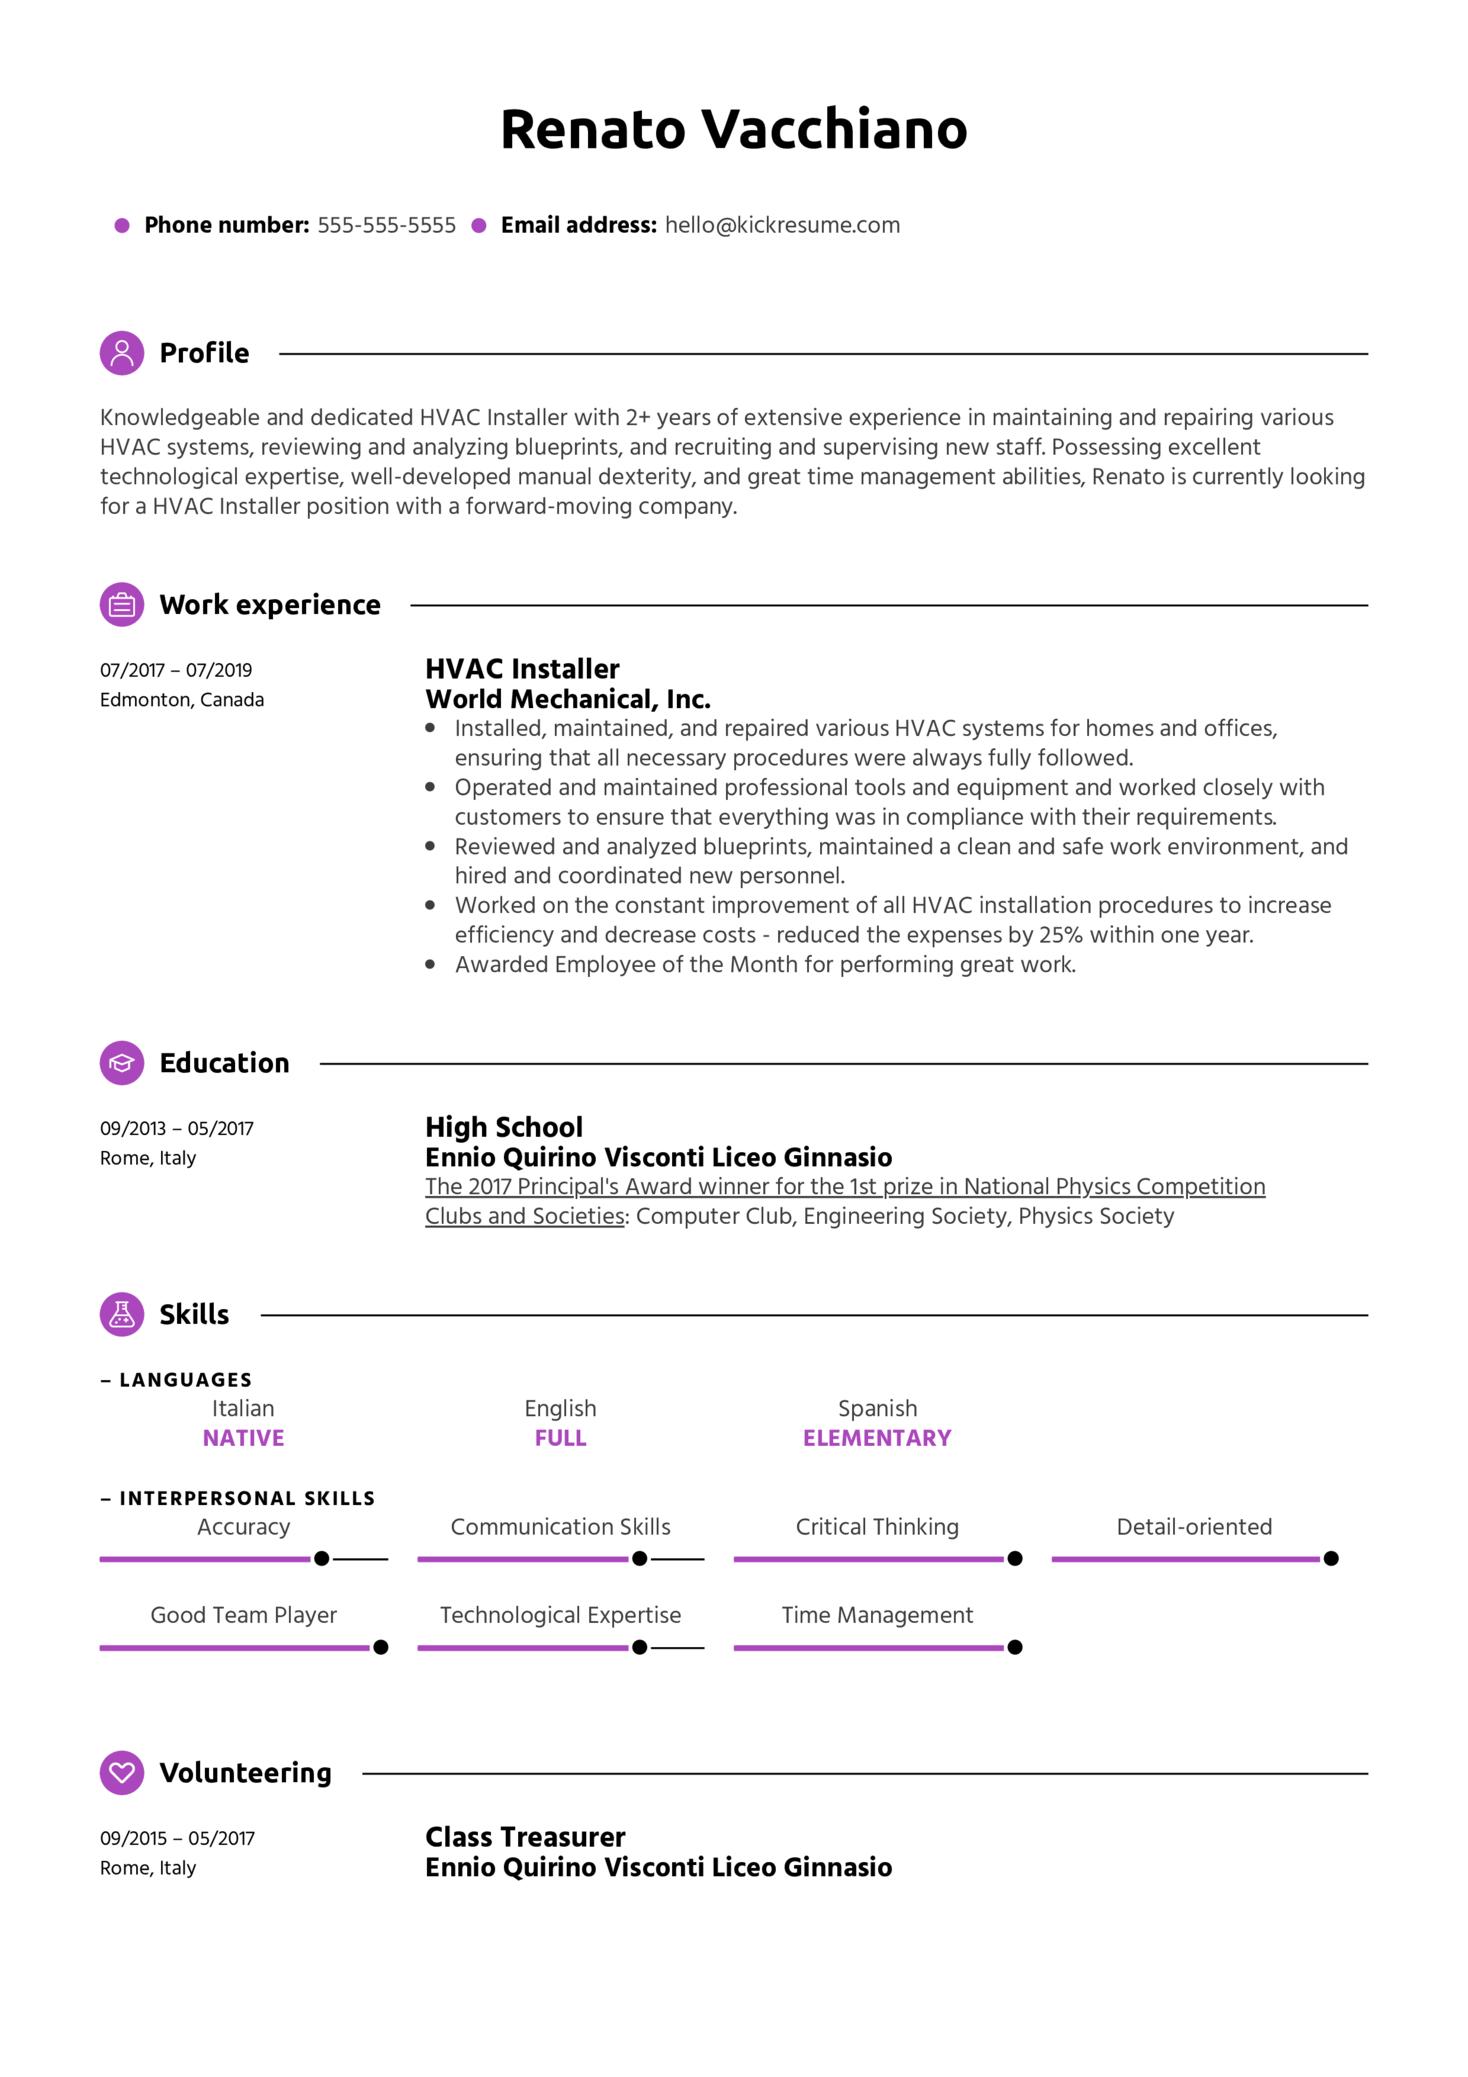 HVAC Installer Resume Example (parte 1)